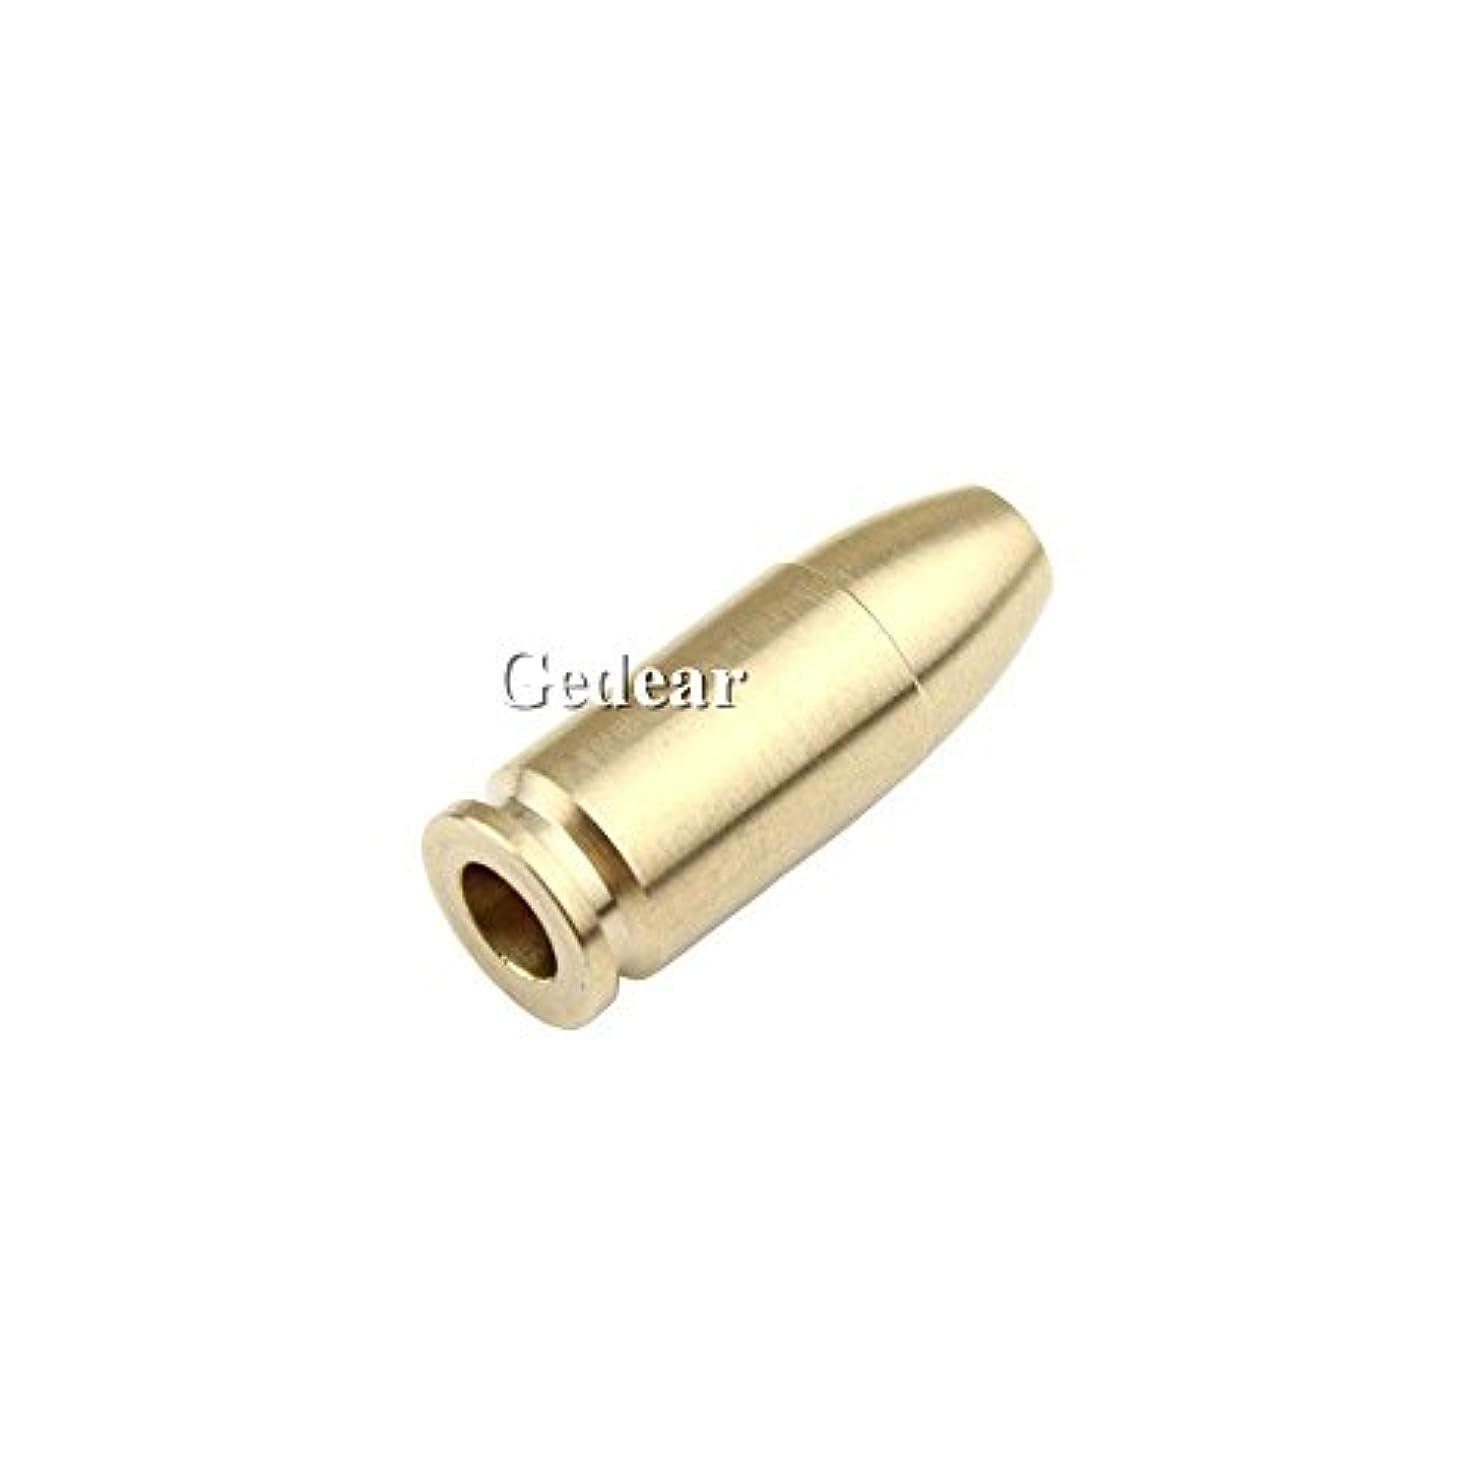 TIKING Bullet Shape Brass Knife Lanyard Bead EDC Zipper Pull 550 Parachute Cord Jewelry Bead Pendant (Brass)